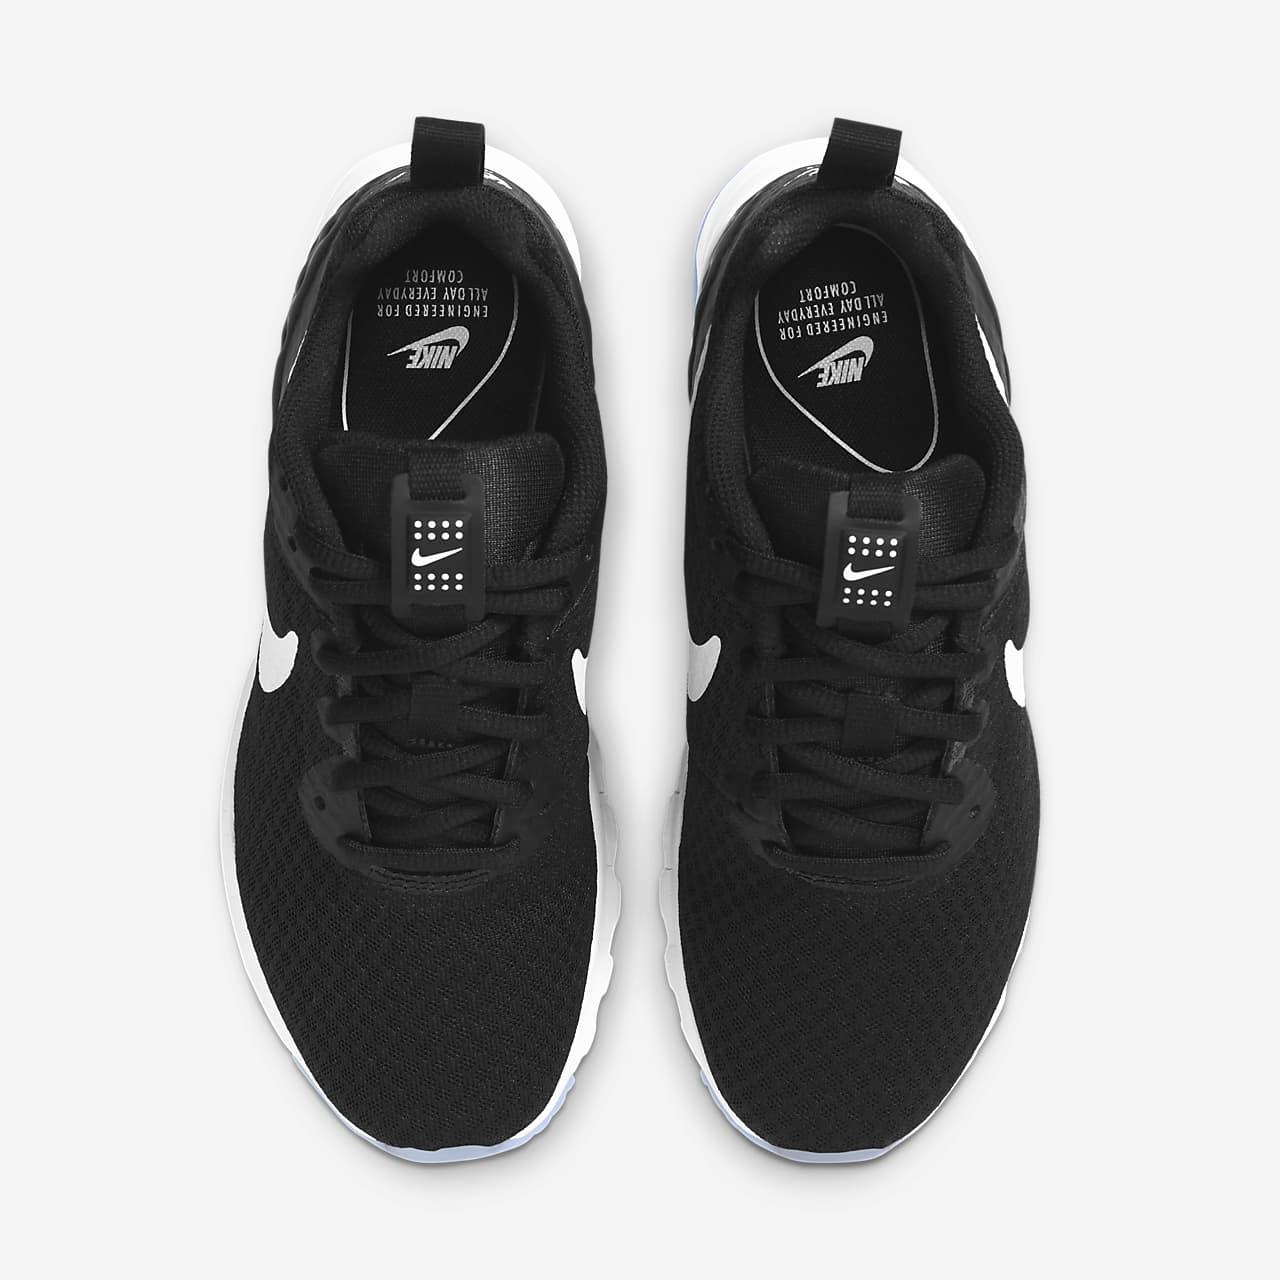 the best attitude 652ec f565e ... Chaussure Nike Air Max Motion Low pour Femme